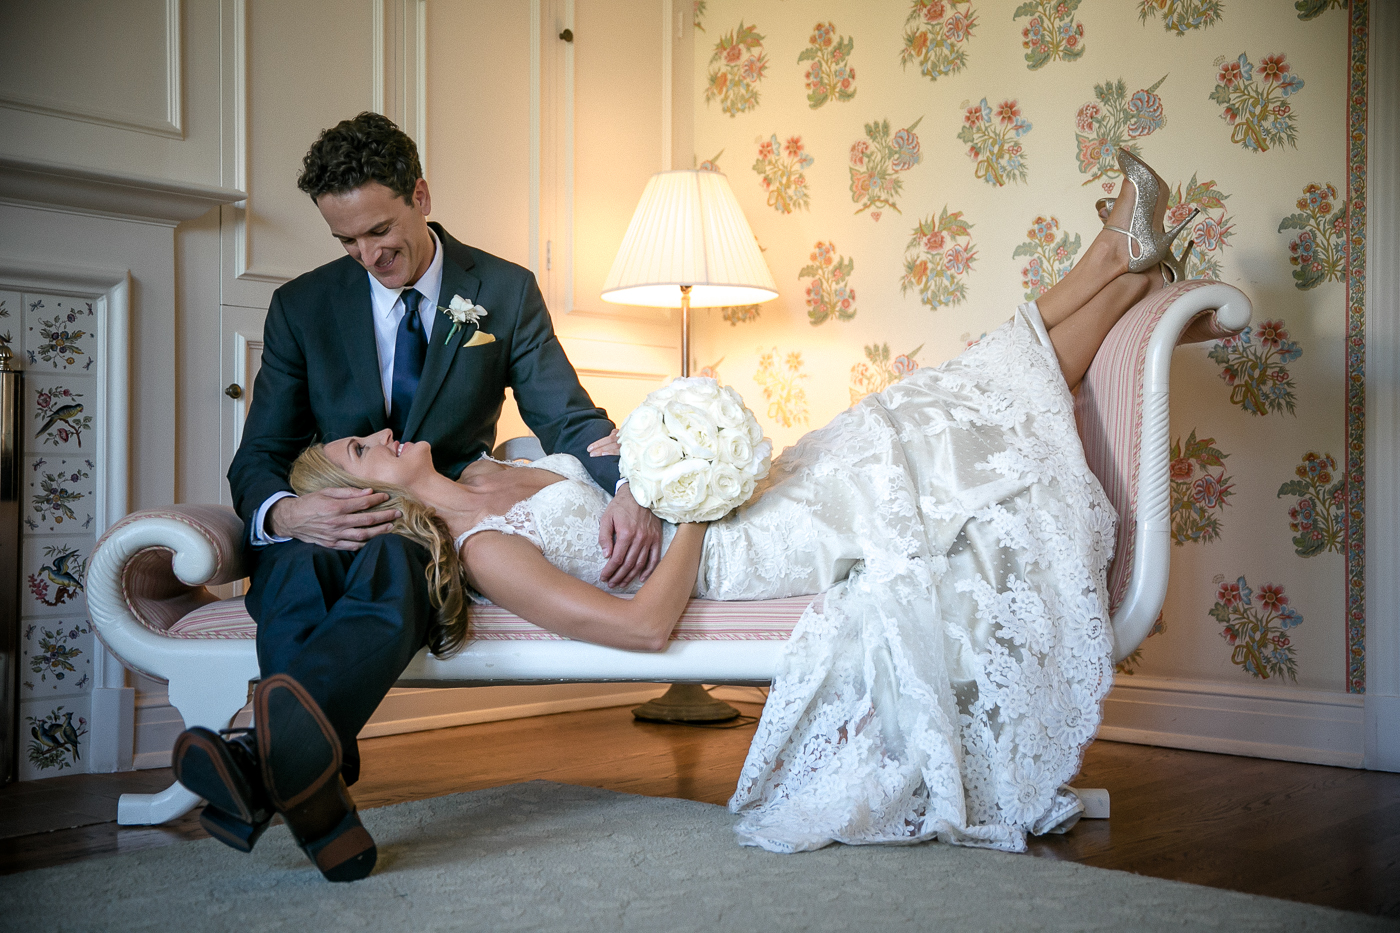 WEDDING_LEAF_PHOTOGRAPHY_DARLINGTON_HOUSE_LA_JOLLA_CATAMARAN_HOTEL_KIM_&_BOB_WED_2013_7X9A5895